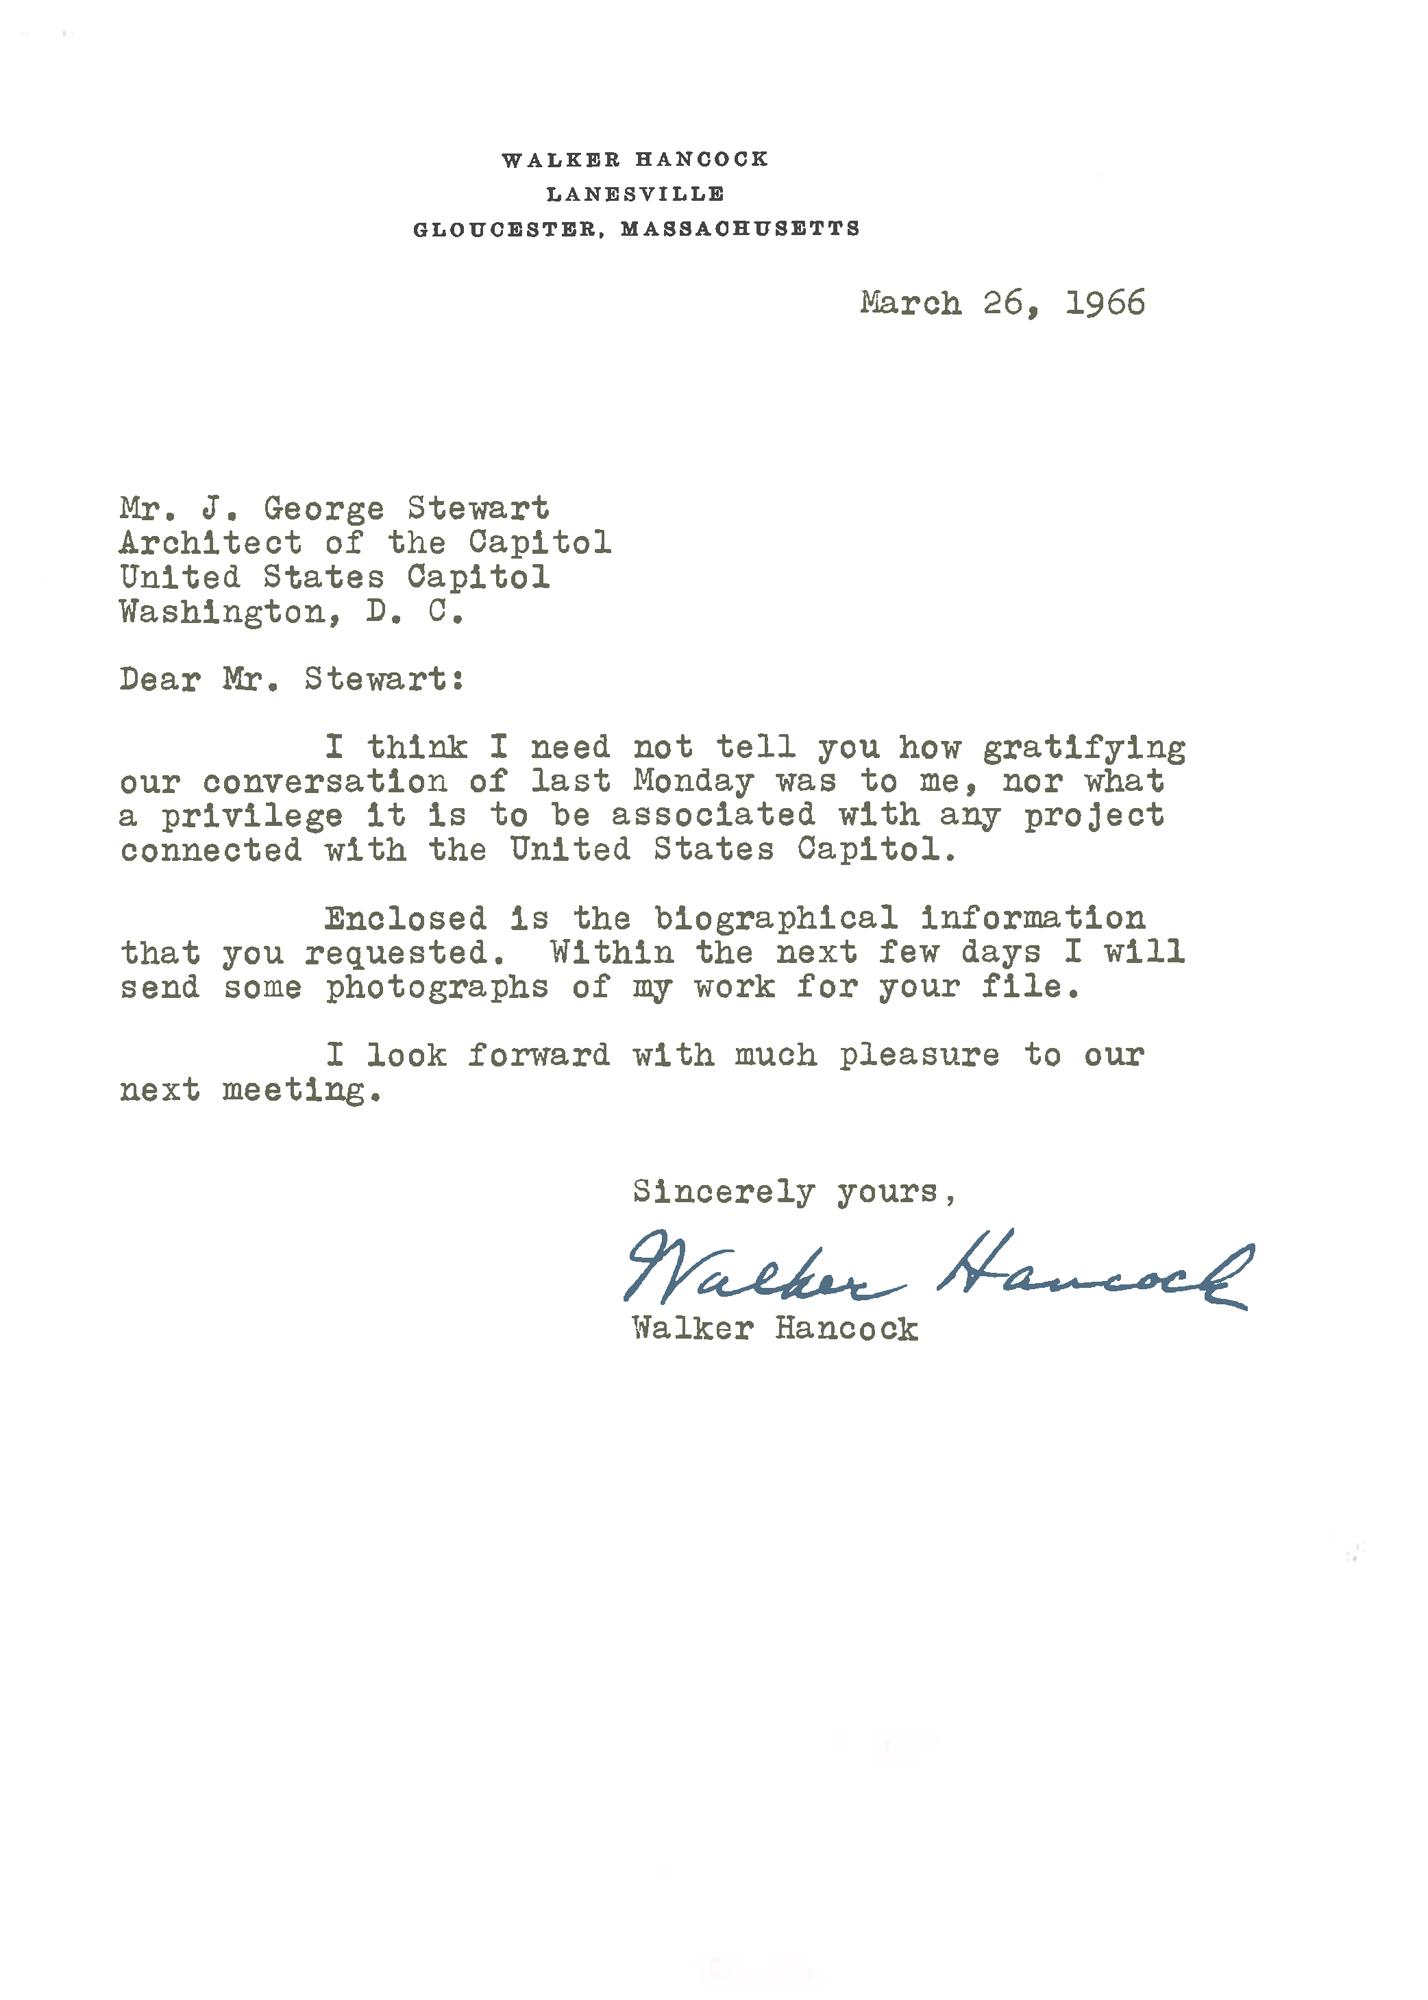 Letter from Walker Hancock to George Stewart